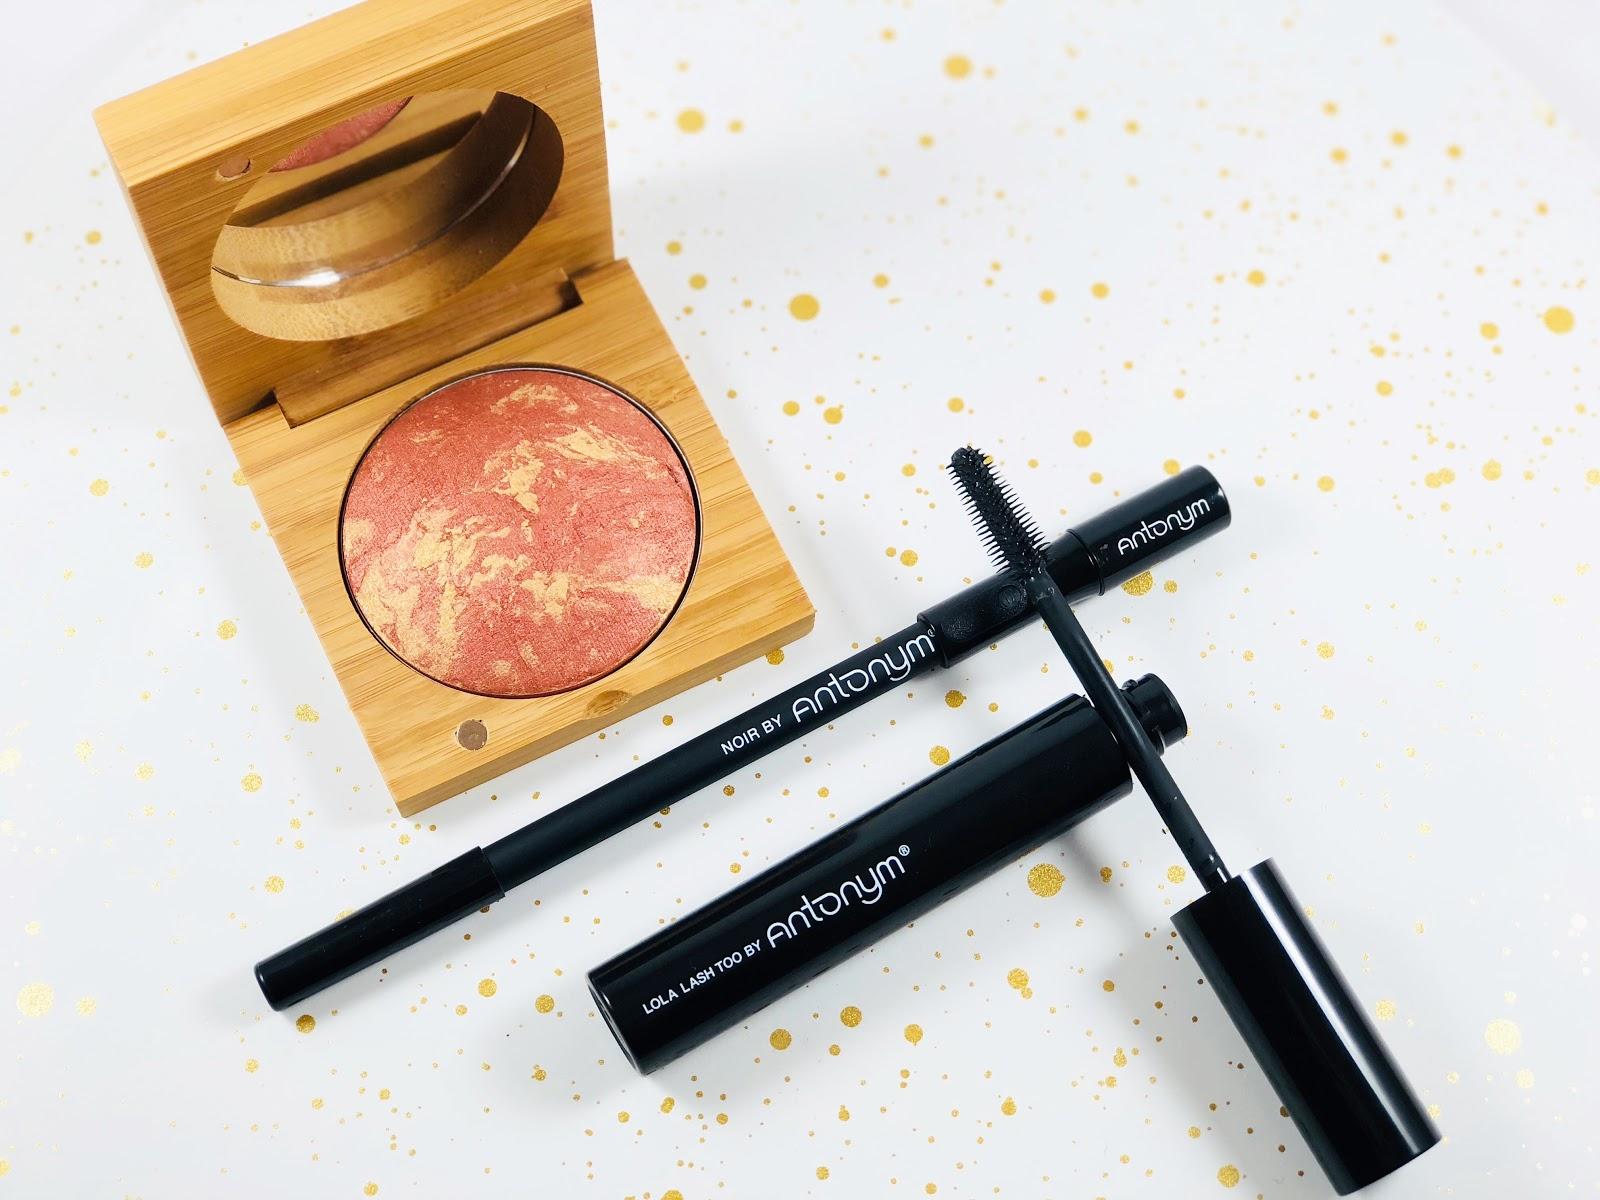 7cfc2a60021 Antonym Cosmetics. Certified Organic Baked Blush Copper. Certified Natural  Eye Pencil Noir. Certified Organic Mascara Lola Lash Too